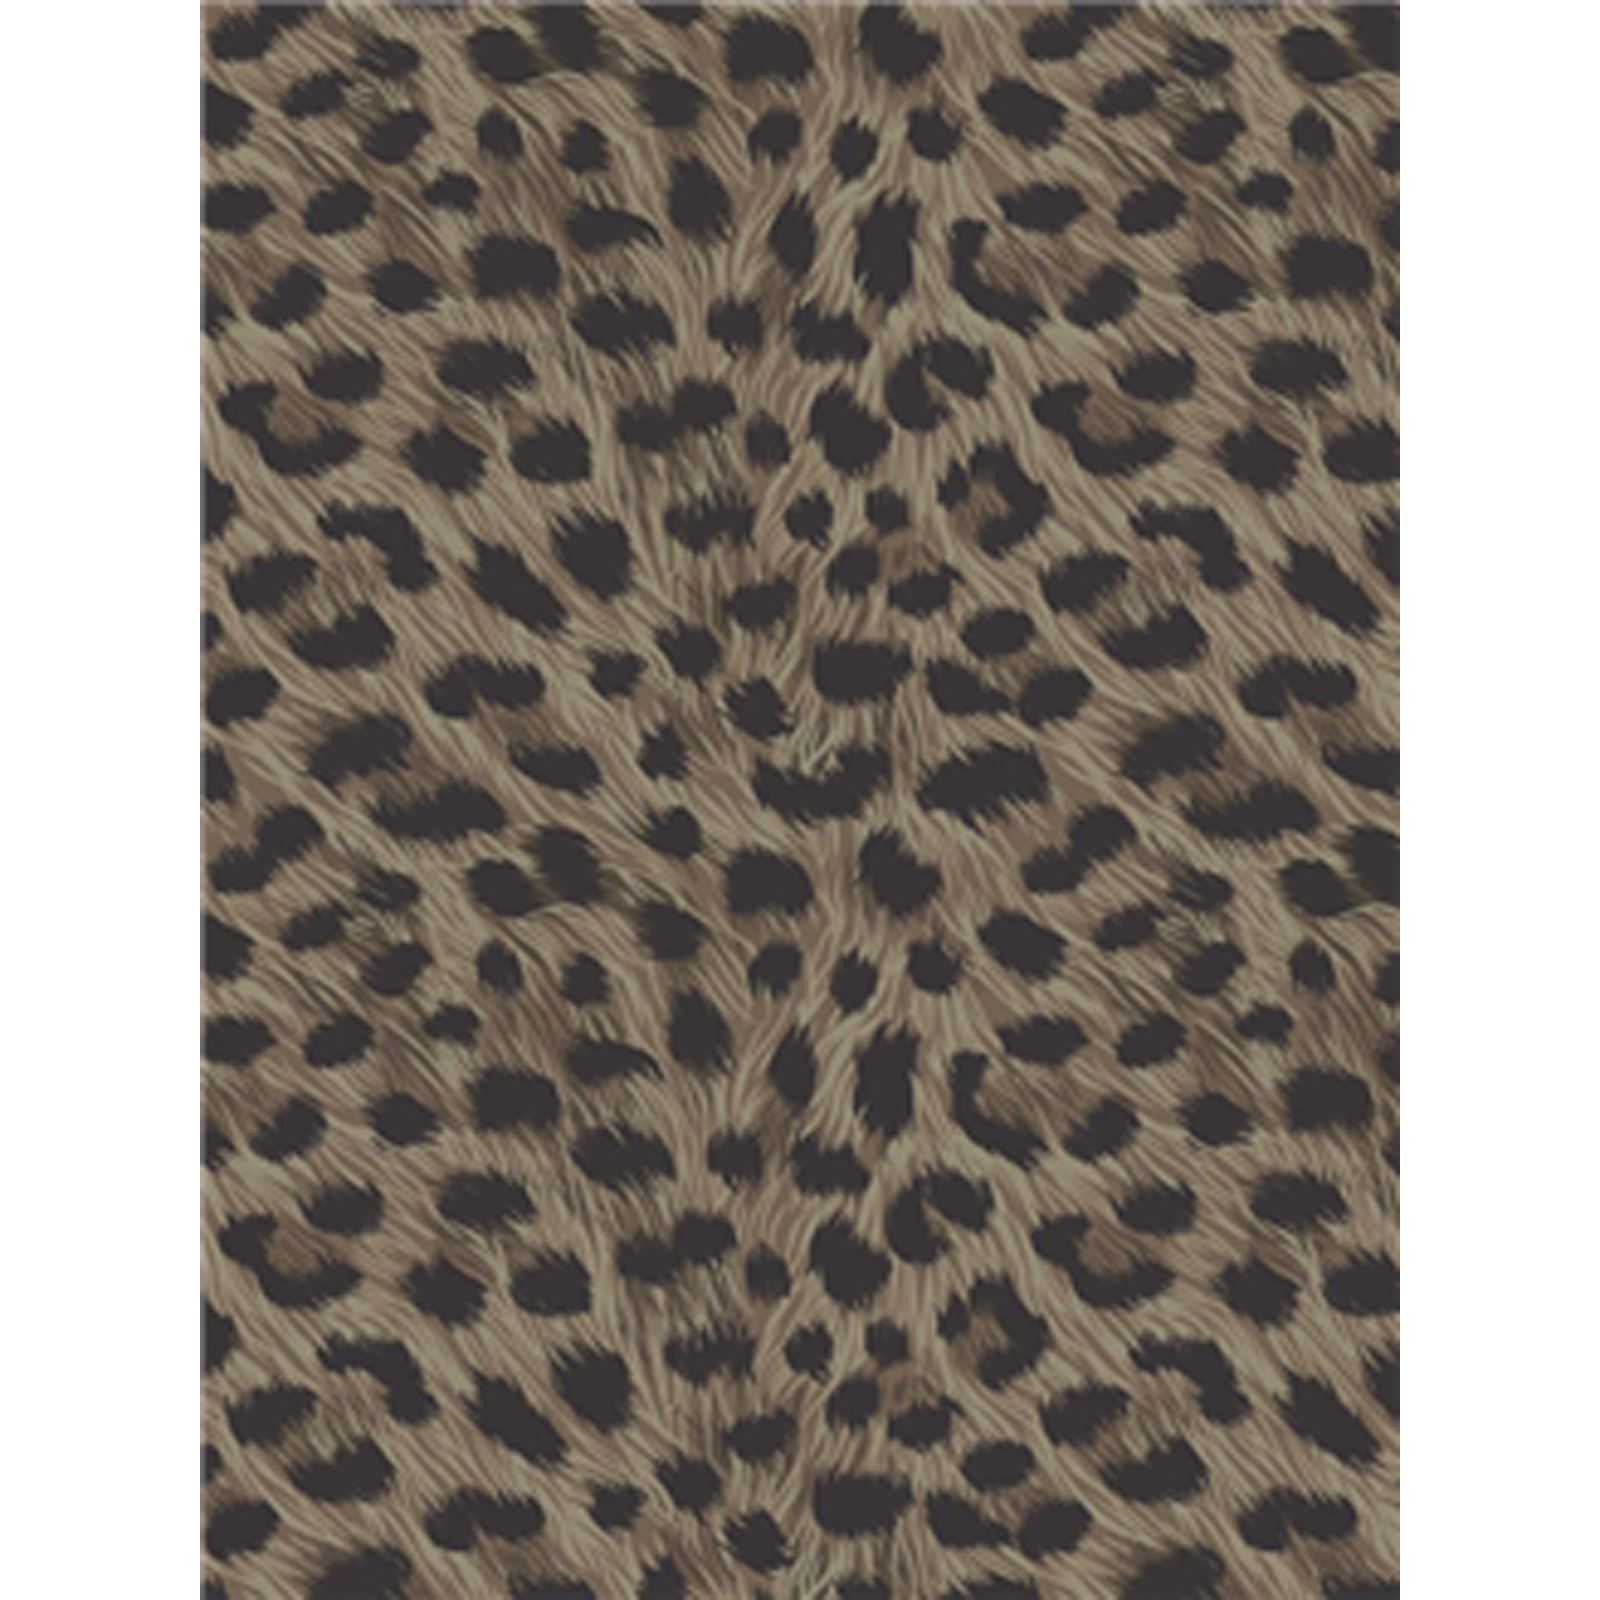 Animal Print Wallpaper Wall Decor Tiger Leopard Zesnake Skin Wolf More Item Description